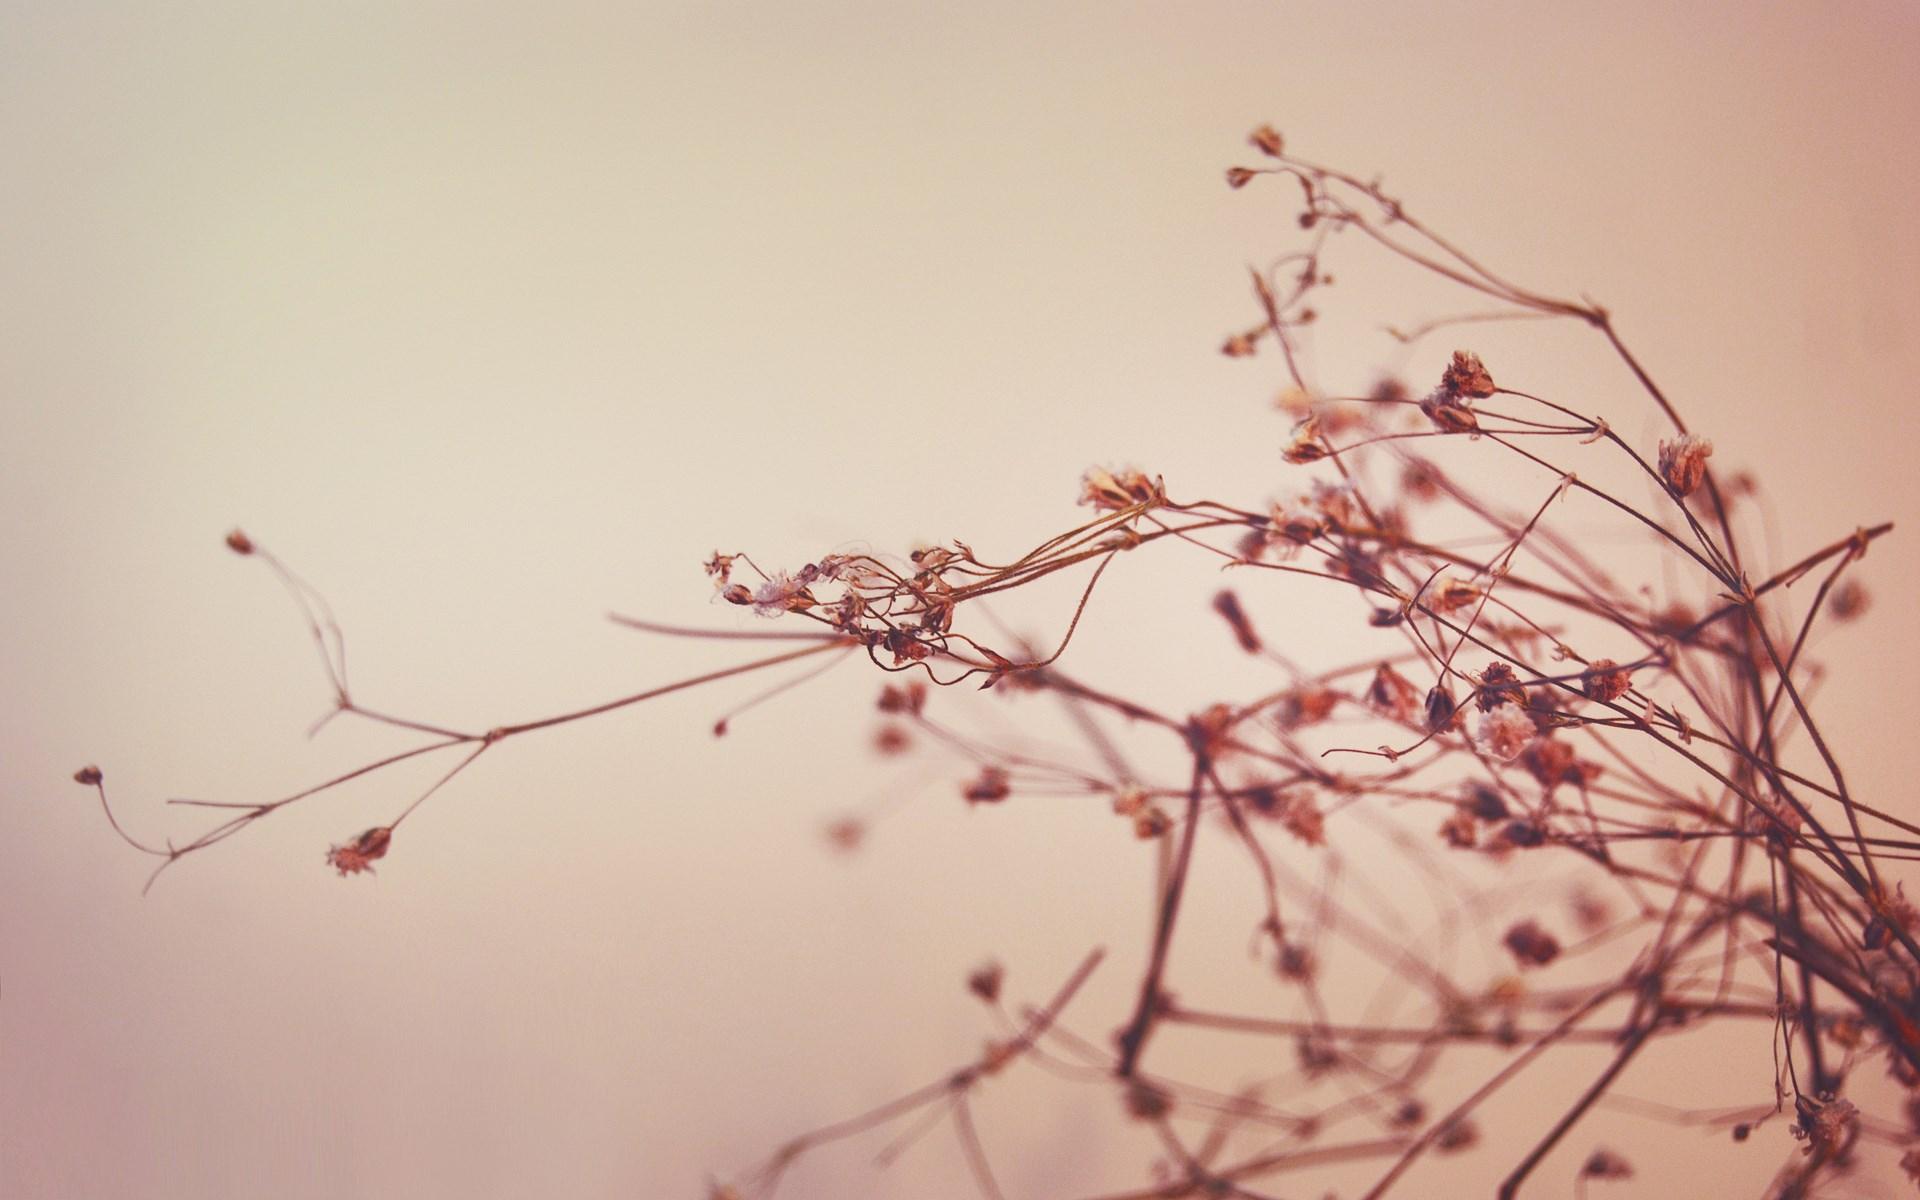 Dry Plants Wallpaper